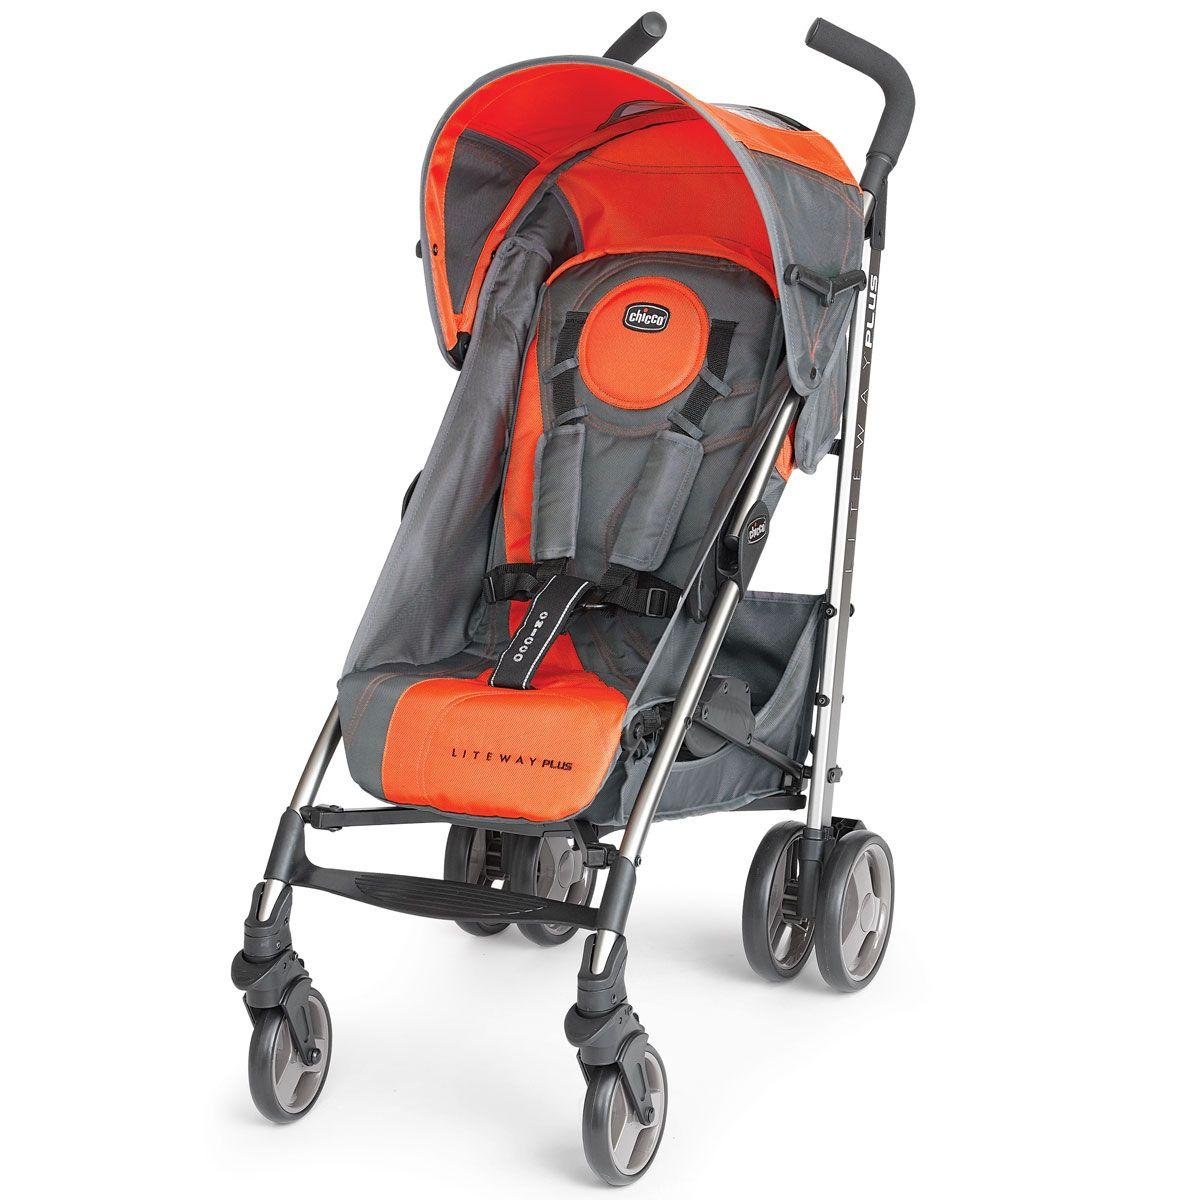 Chicco Liteway Plus Umbrella Stroller & Travel System on